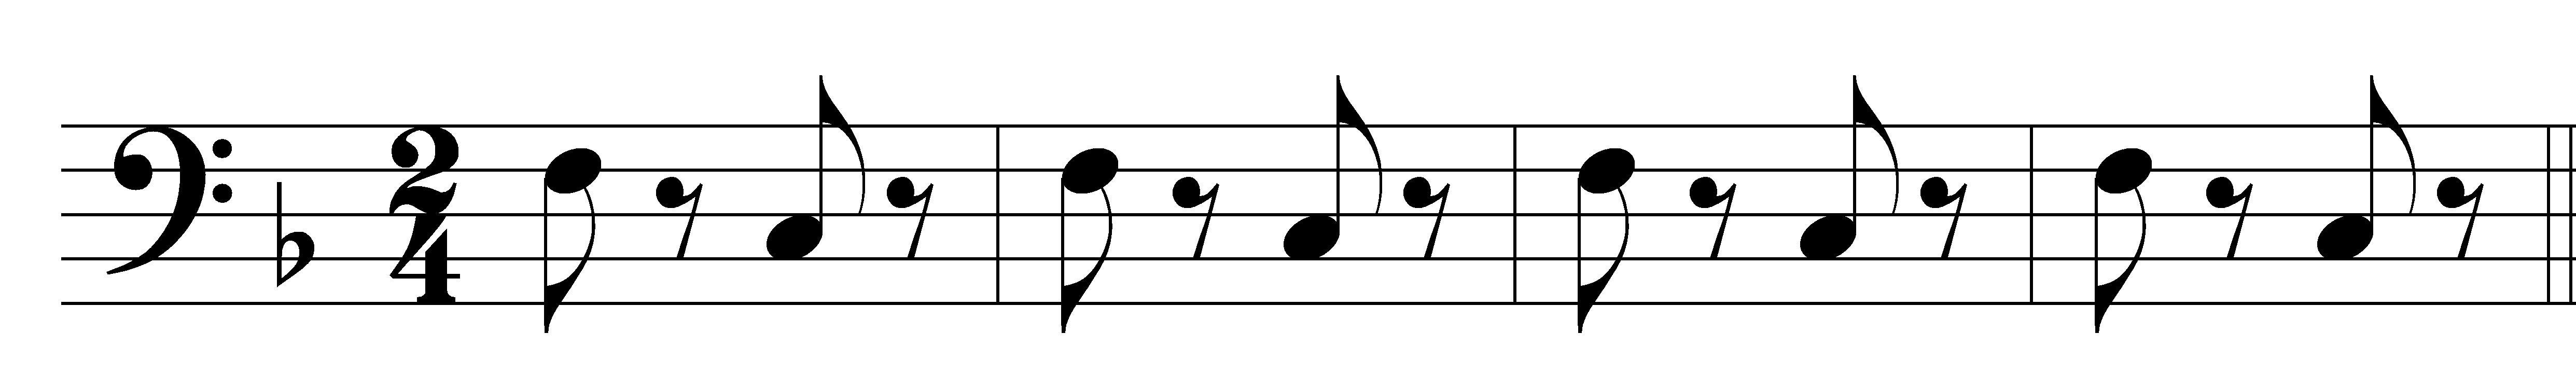 "Image of bassline from ""Toreador Song"" in Bizet's Carmen."